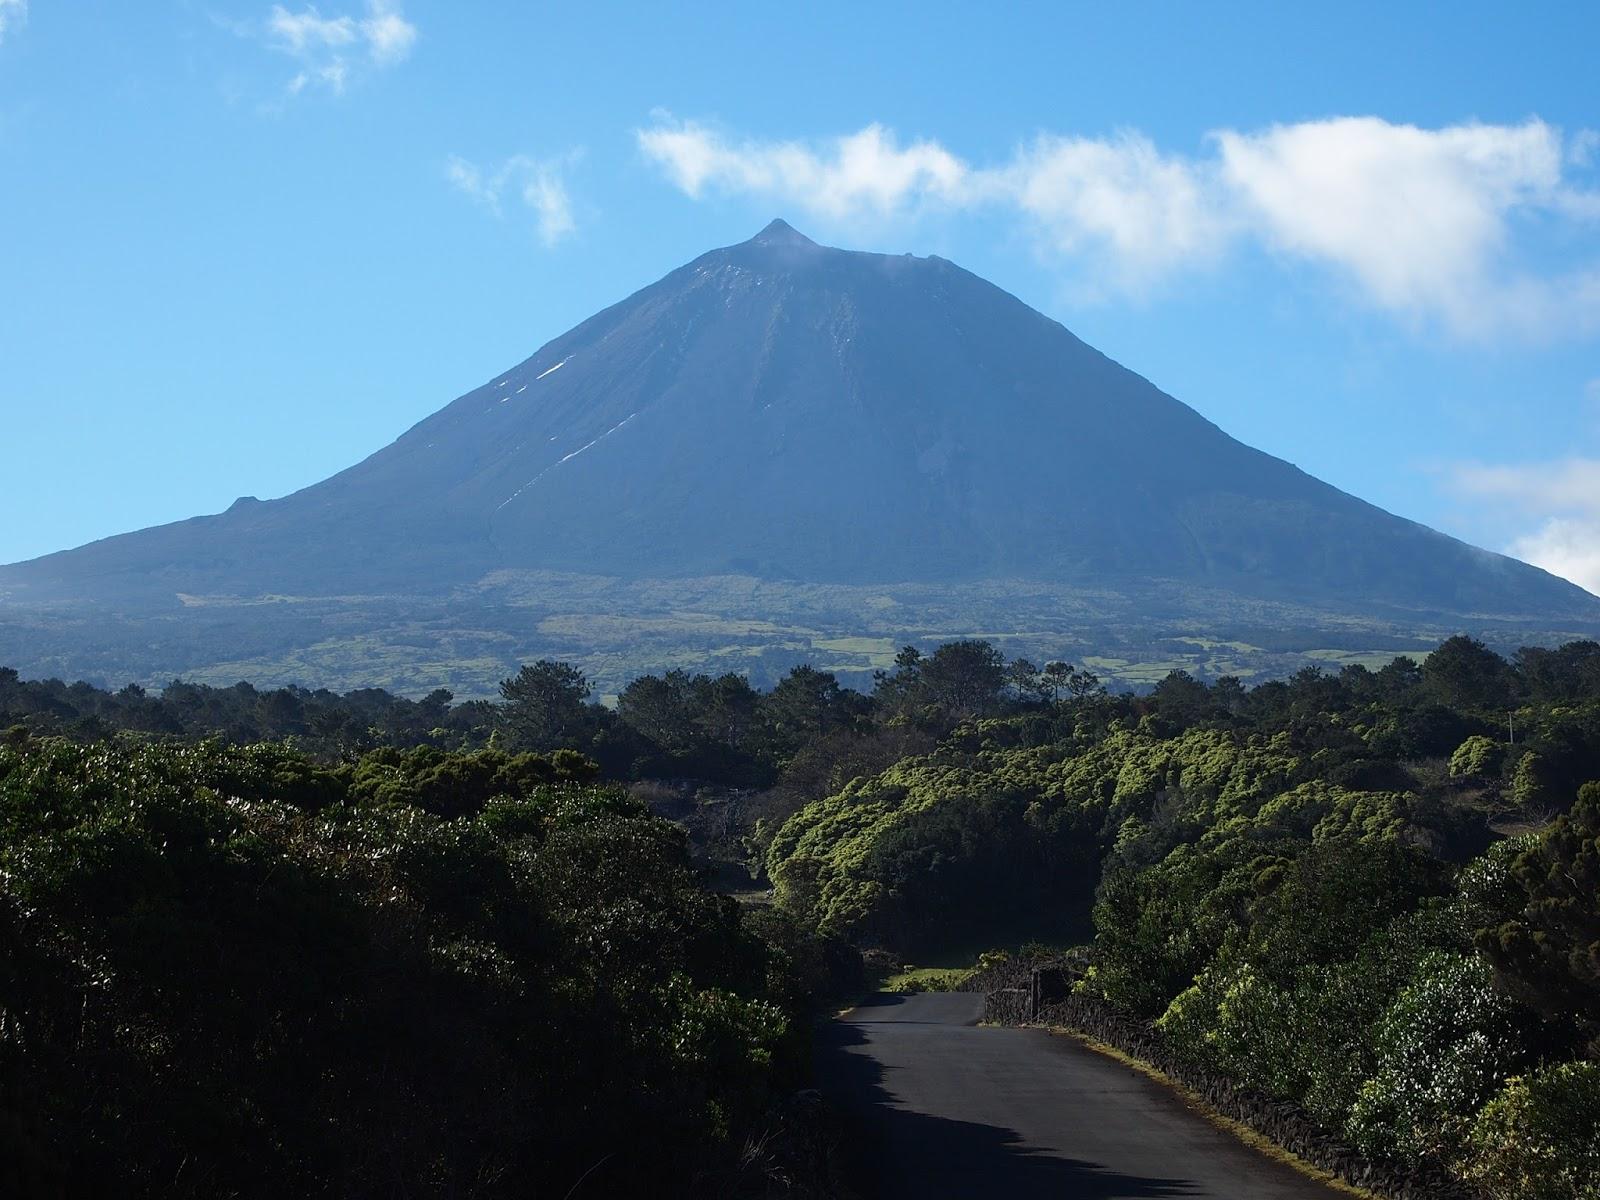 Trail Map - Pico Mountain